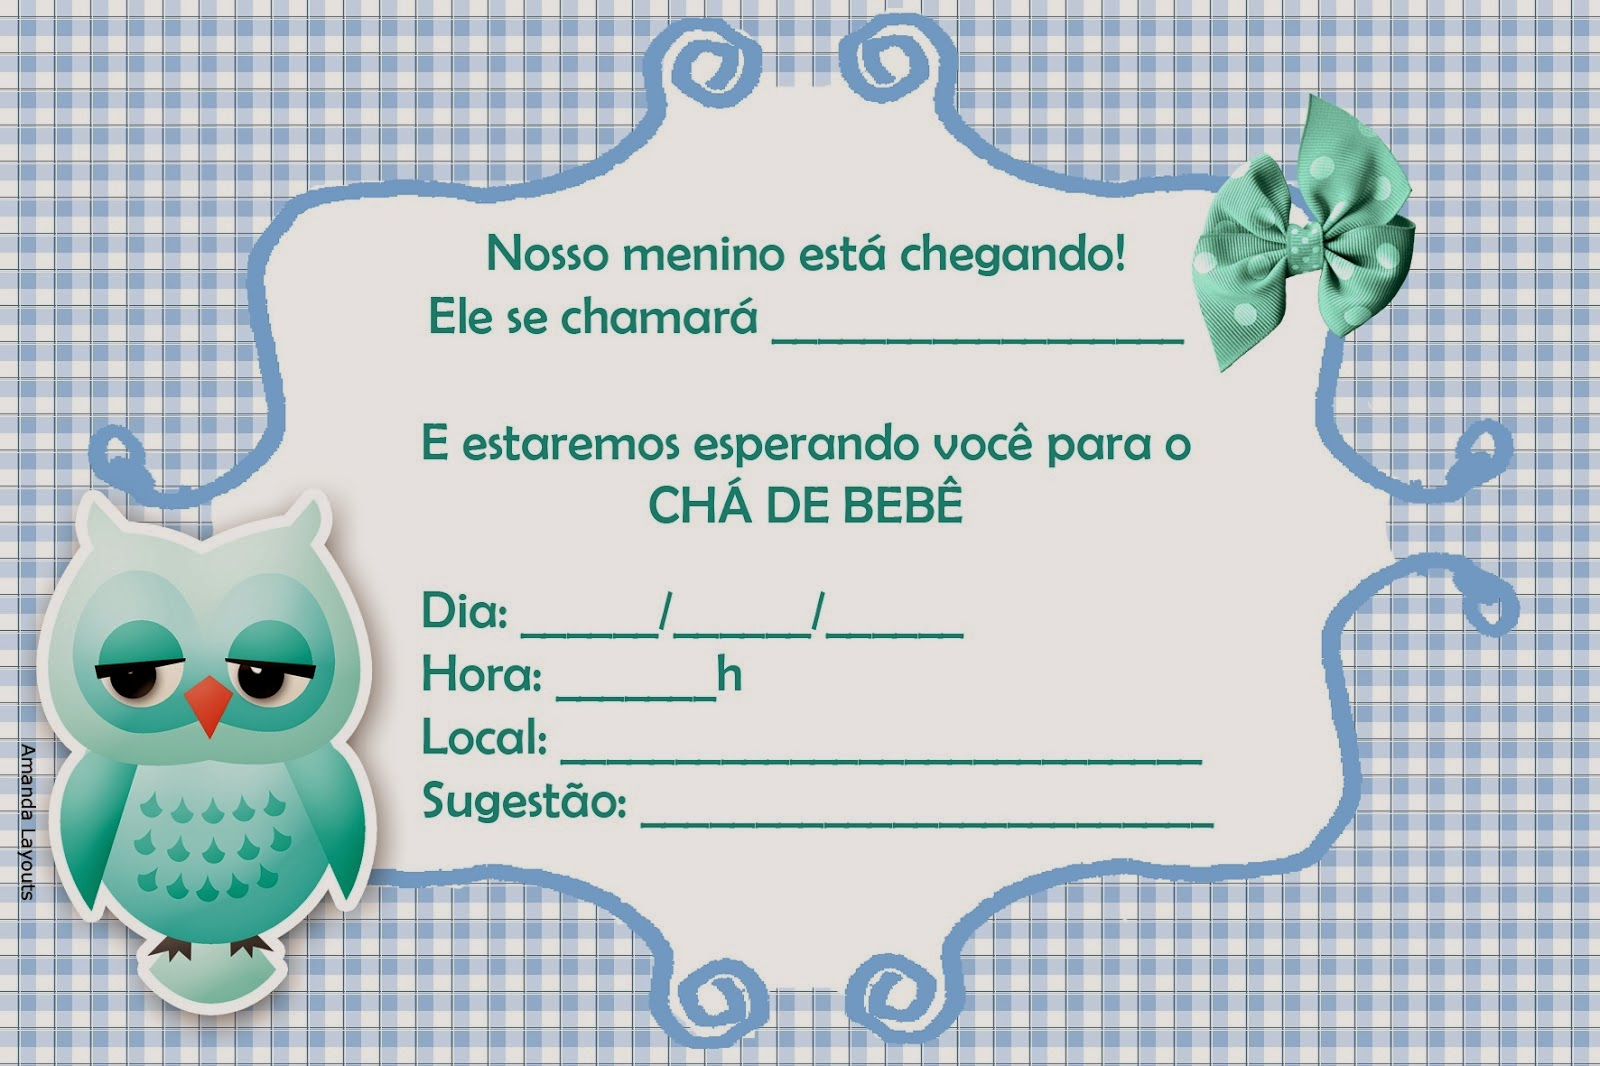 Convite para chá de bebê online 6